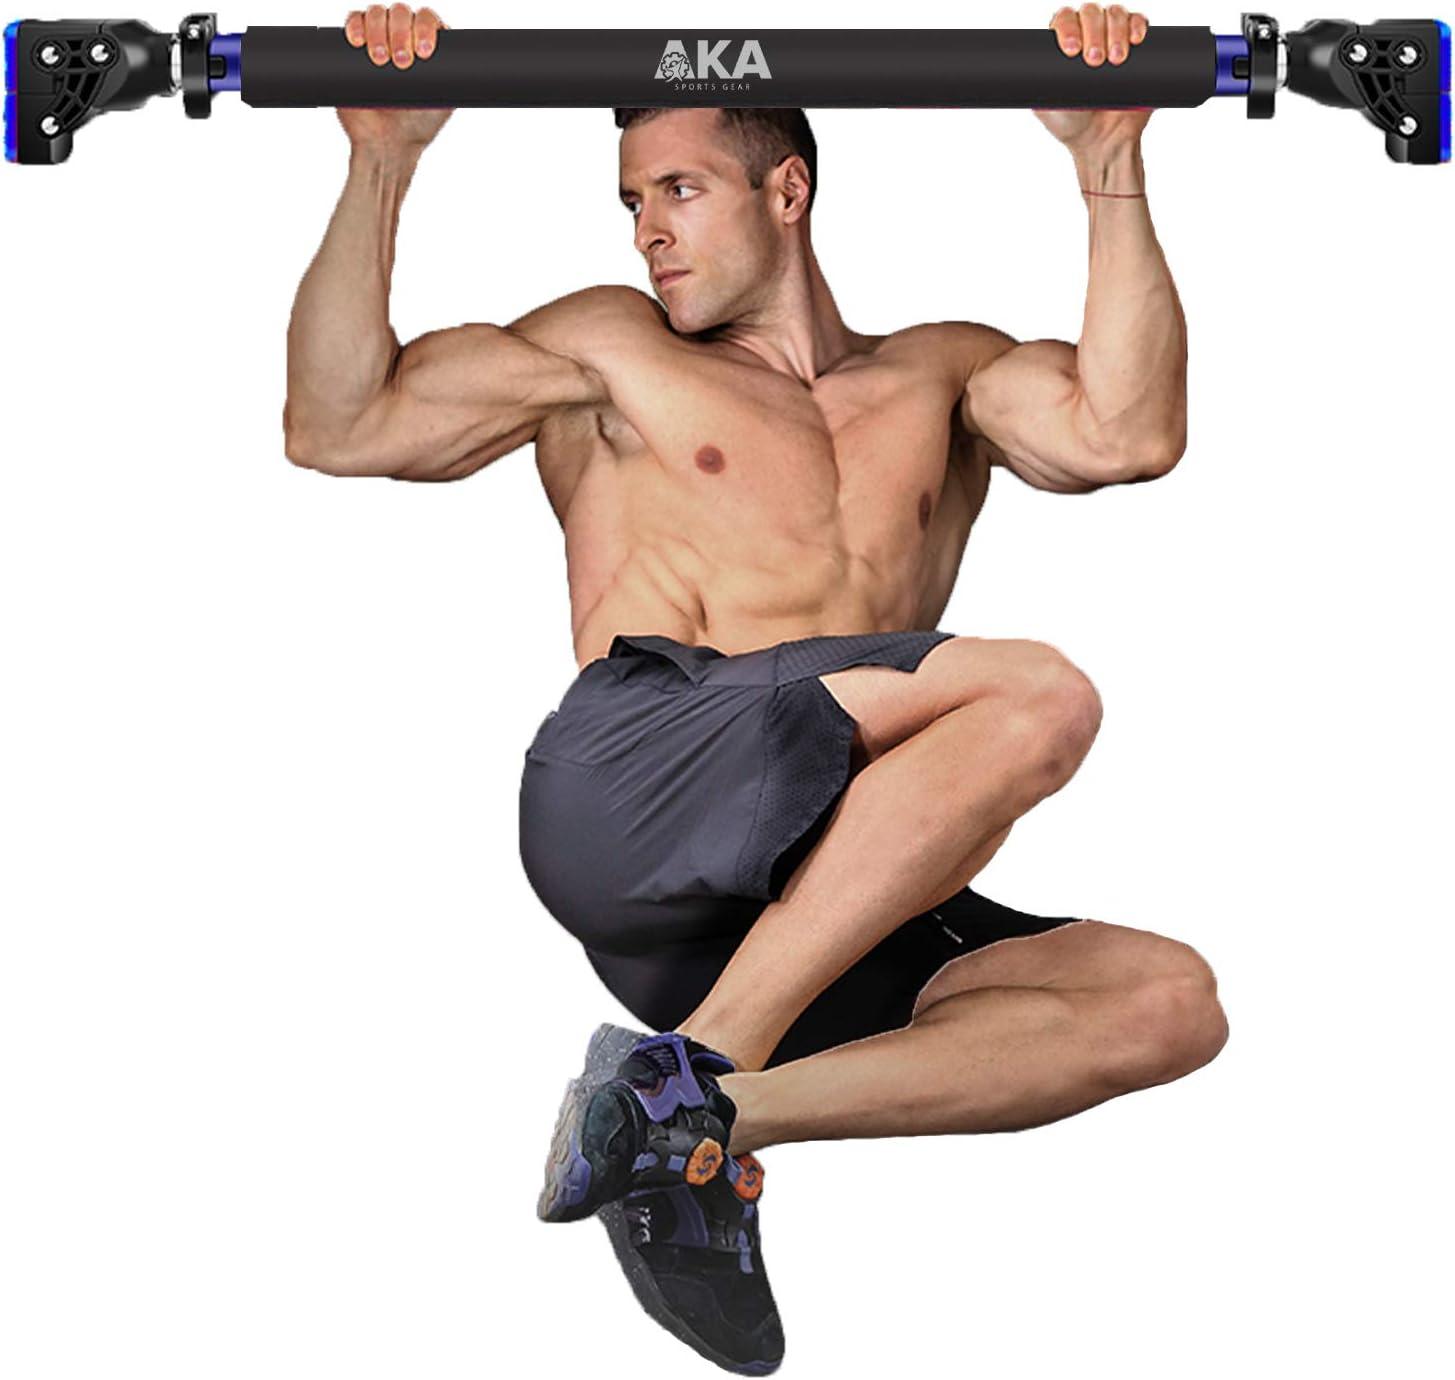 DEDAKJ Pull Up Bar Pullup Bar Chin Up Bar for Doorway Home Gym Equipment 37.8